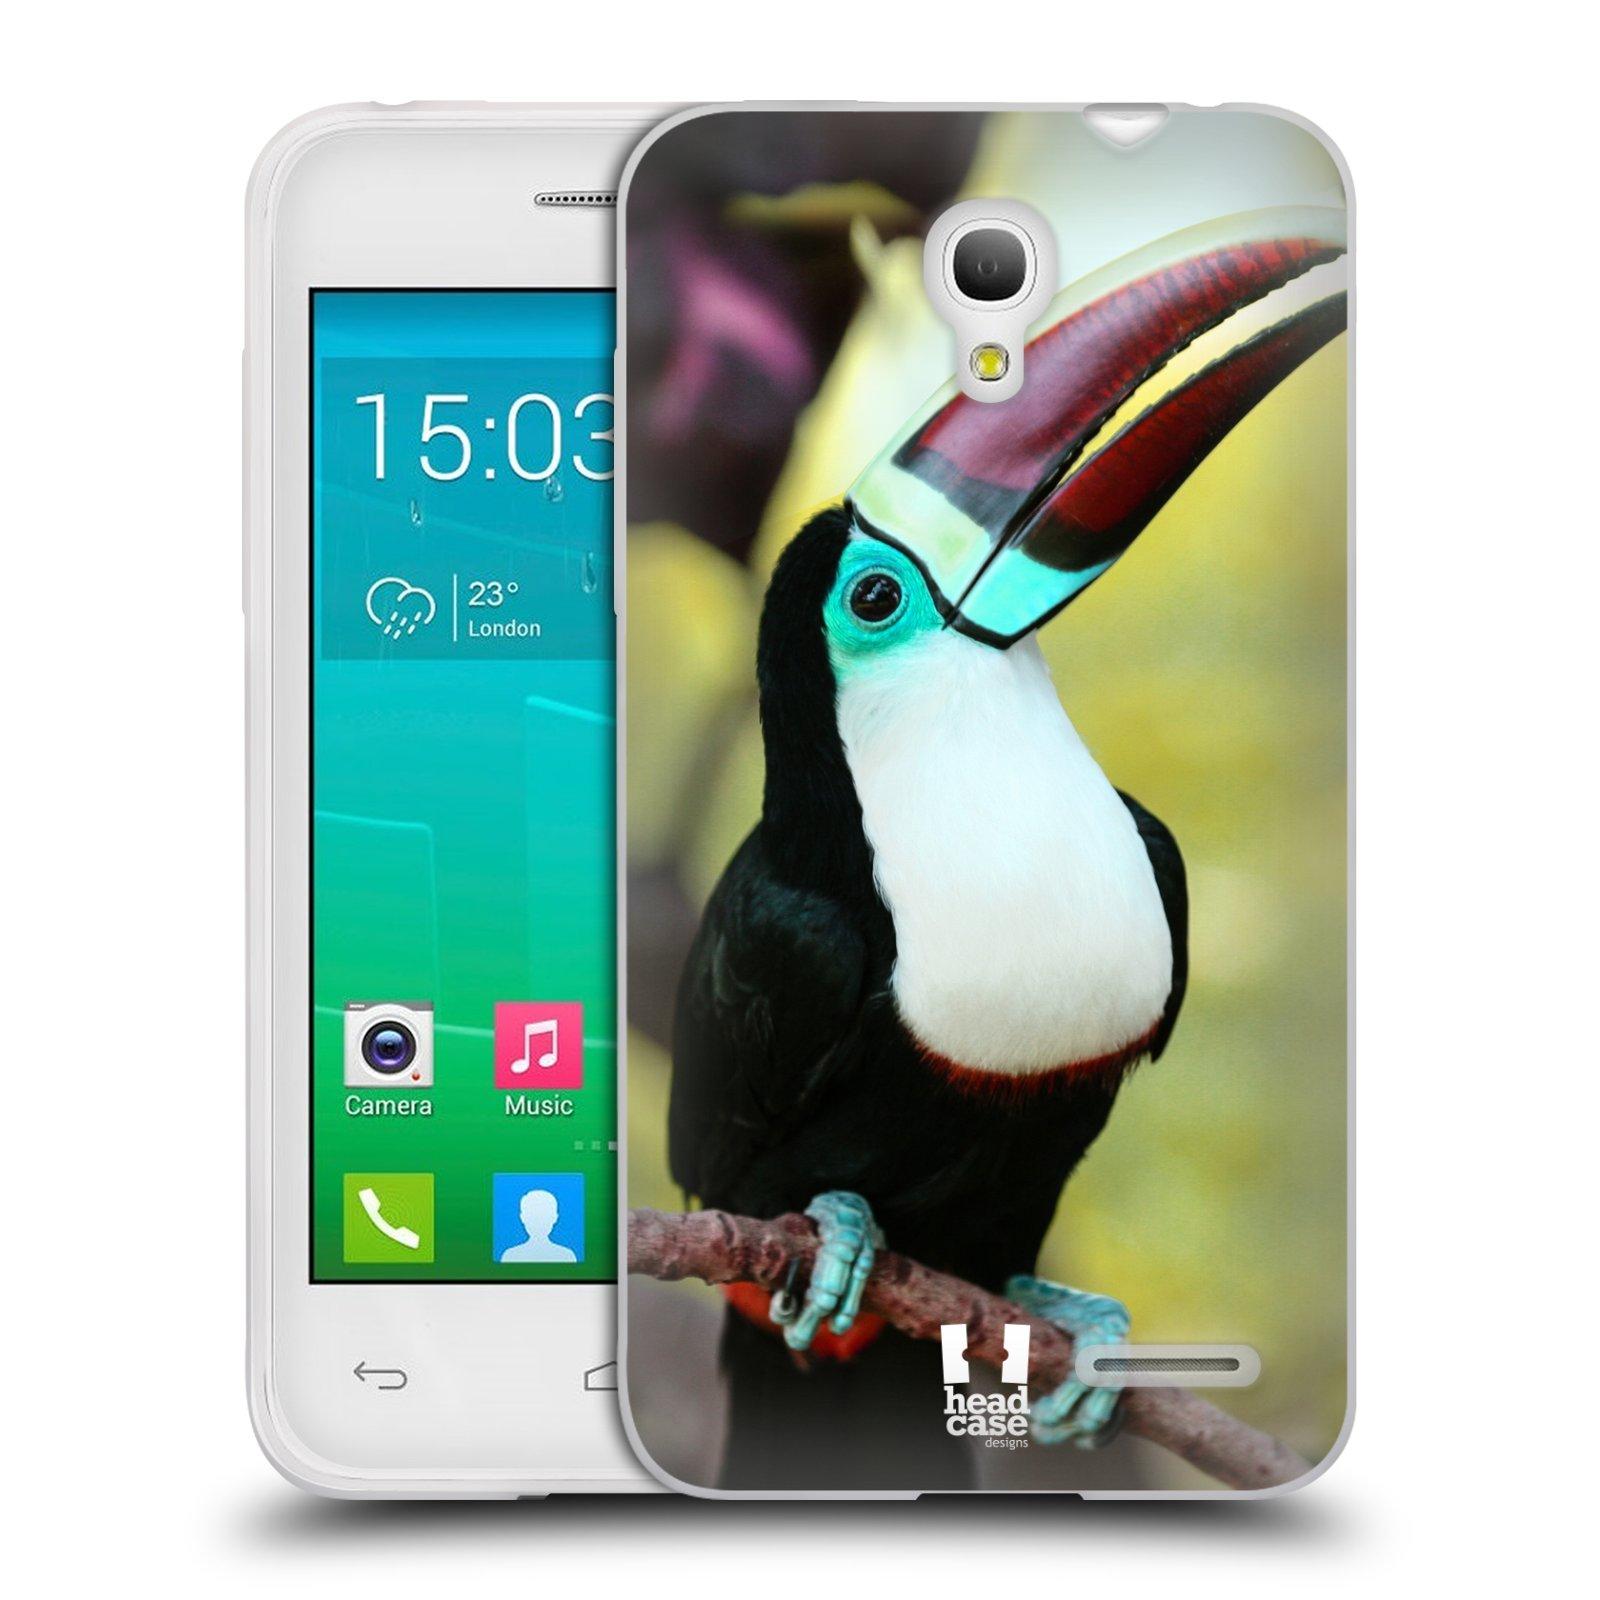 HEAD CASE silikonový obal na mobil Alcatel POP S3 OT-5050Y vzor slavná zvířata foto tukan